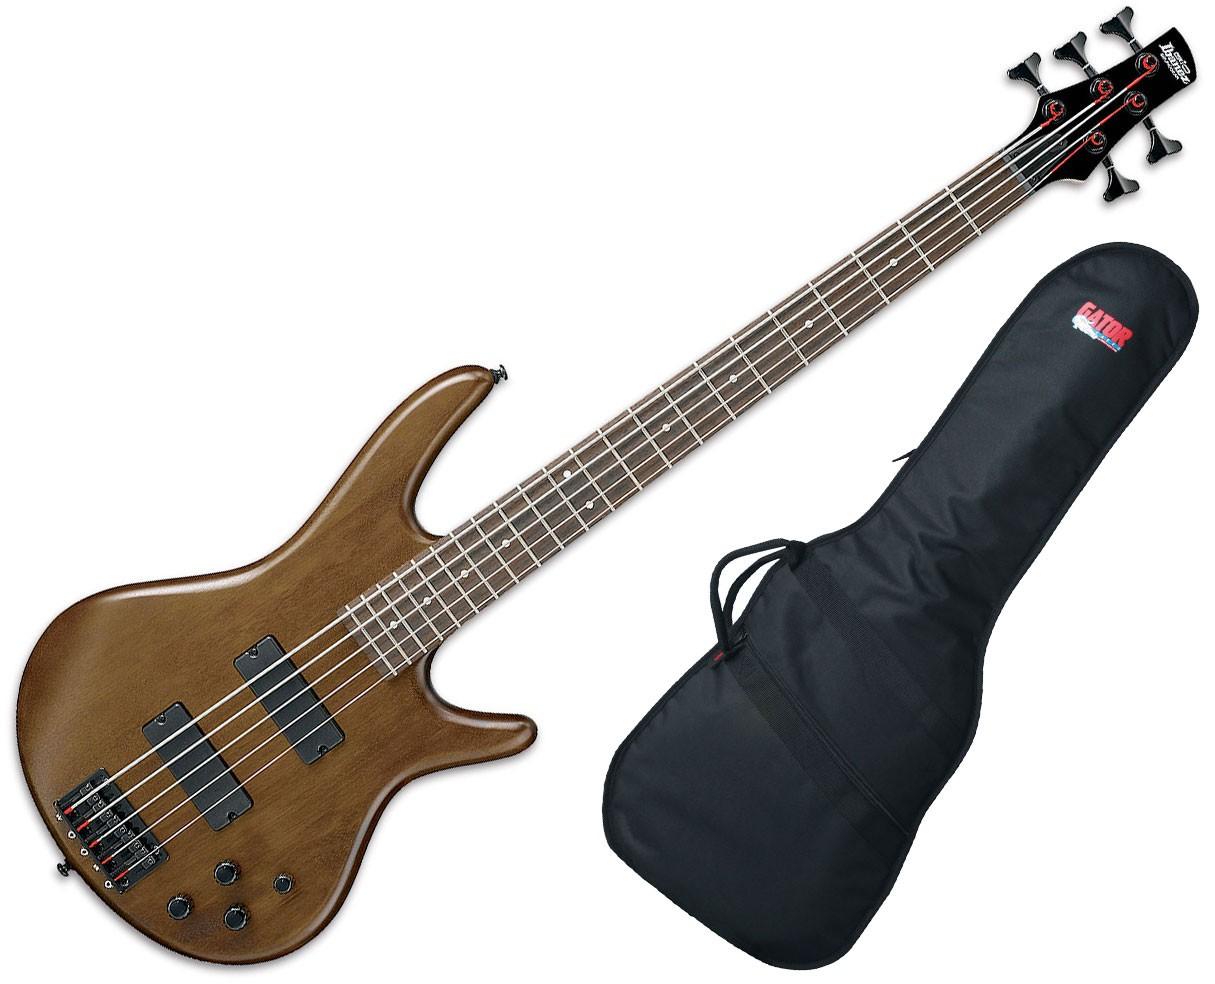 Ibanez GSR205BWNF GSR 5-String Electric Bass Guitar - Walnut Flat with Gator GBE-BASS